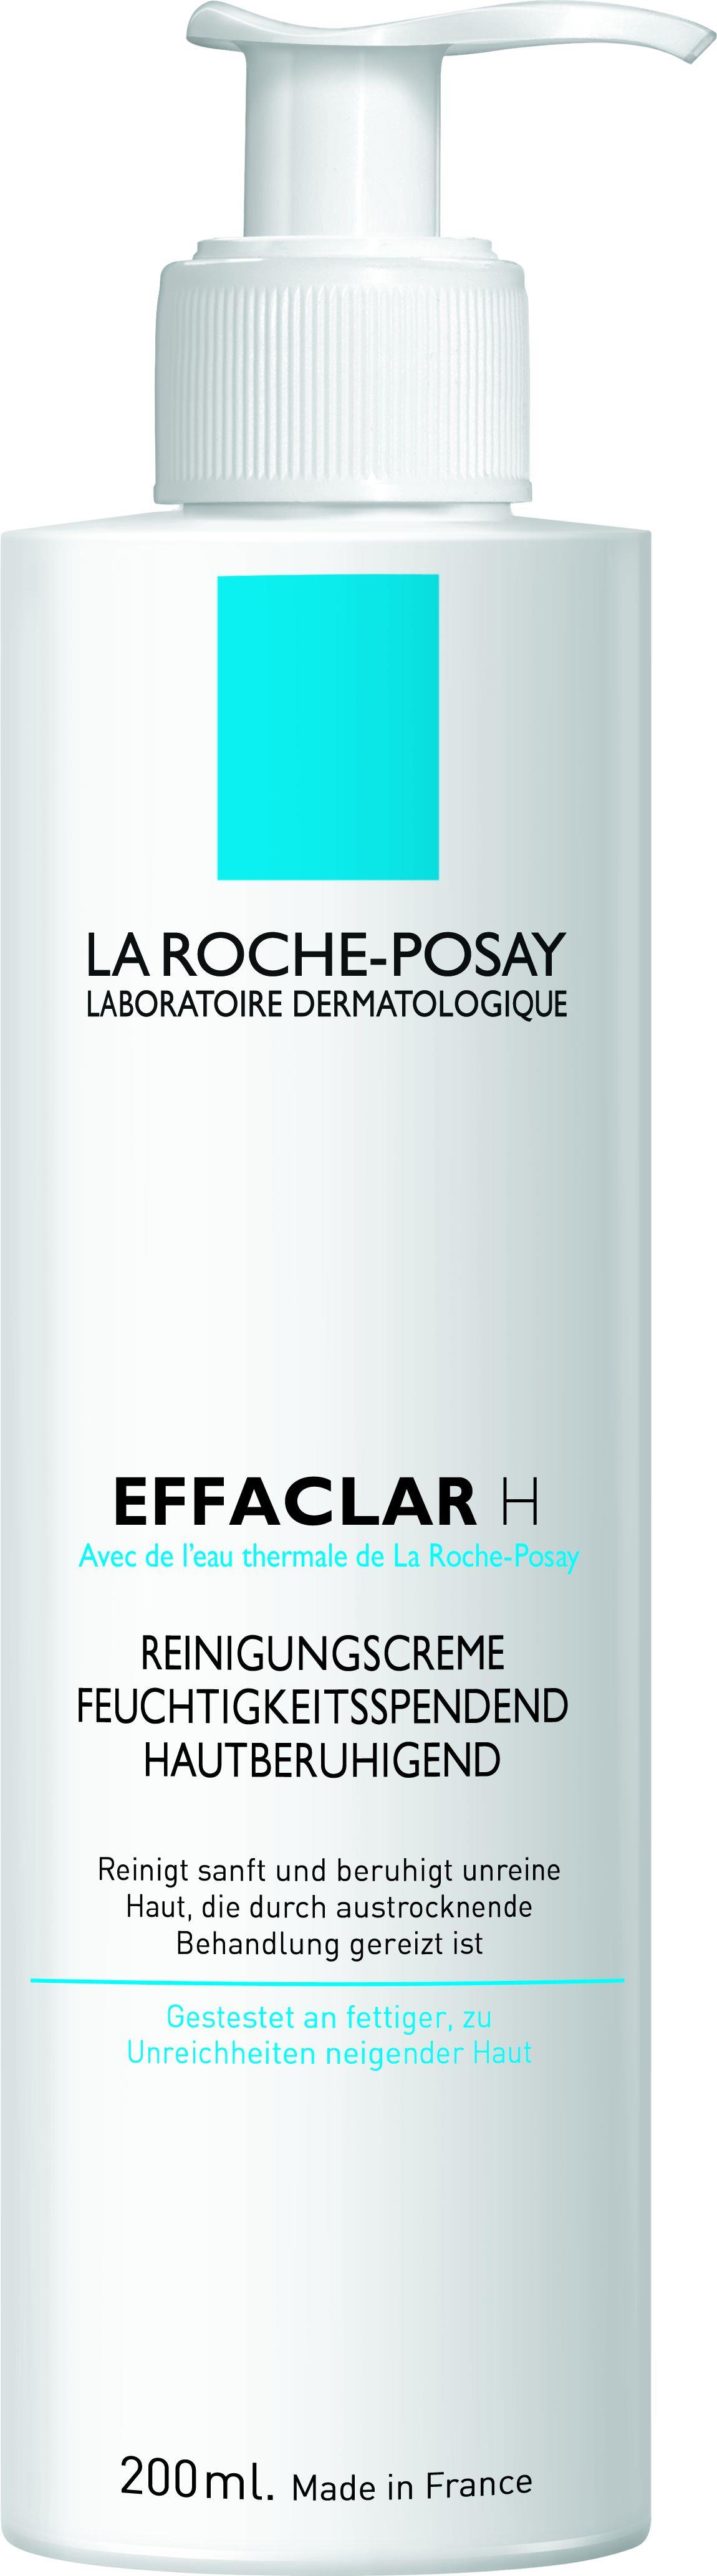 La Roche-Posay Effaclar H Beruhigende Reinigungscreme